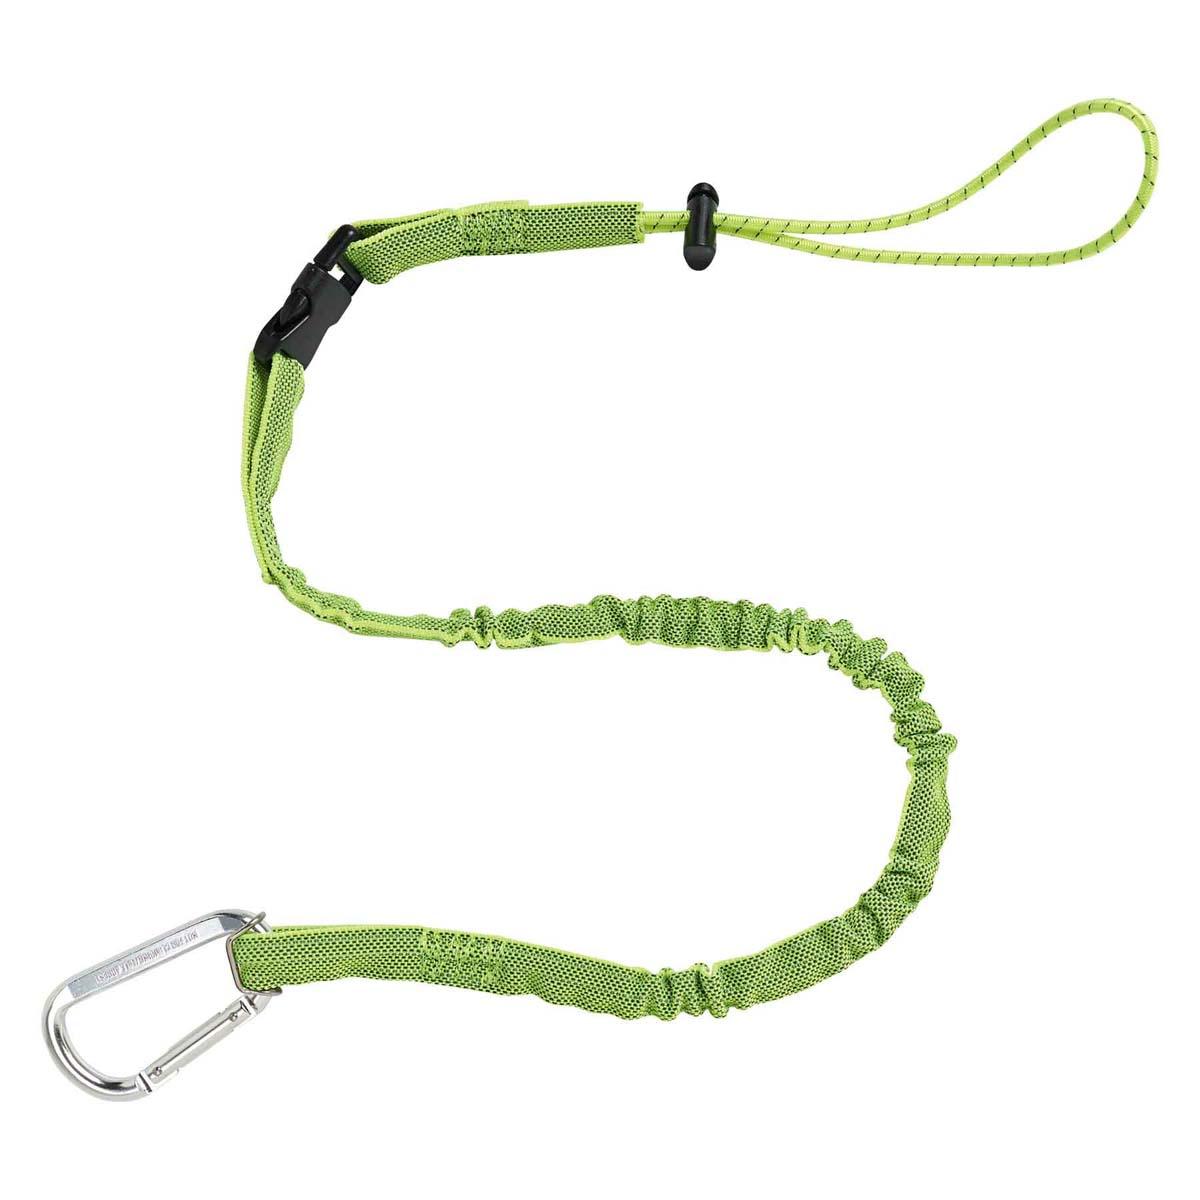 3102 Extended Lime Detachable Single Carabiner-5lb